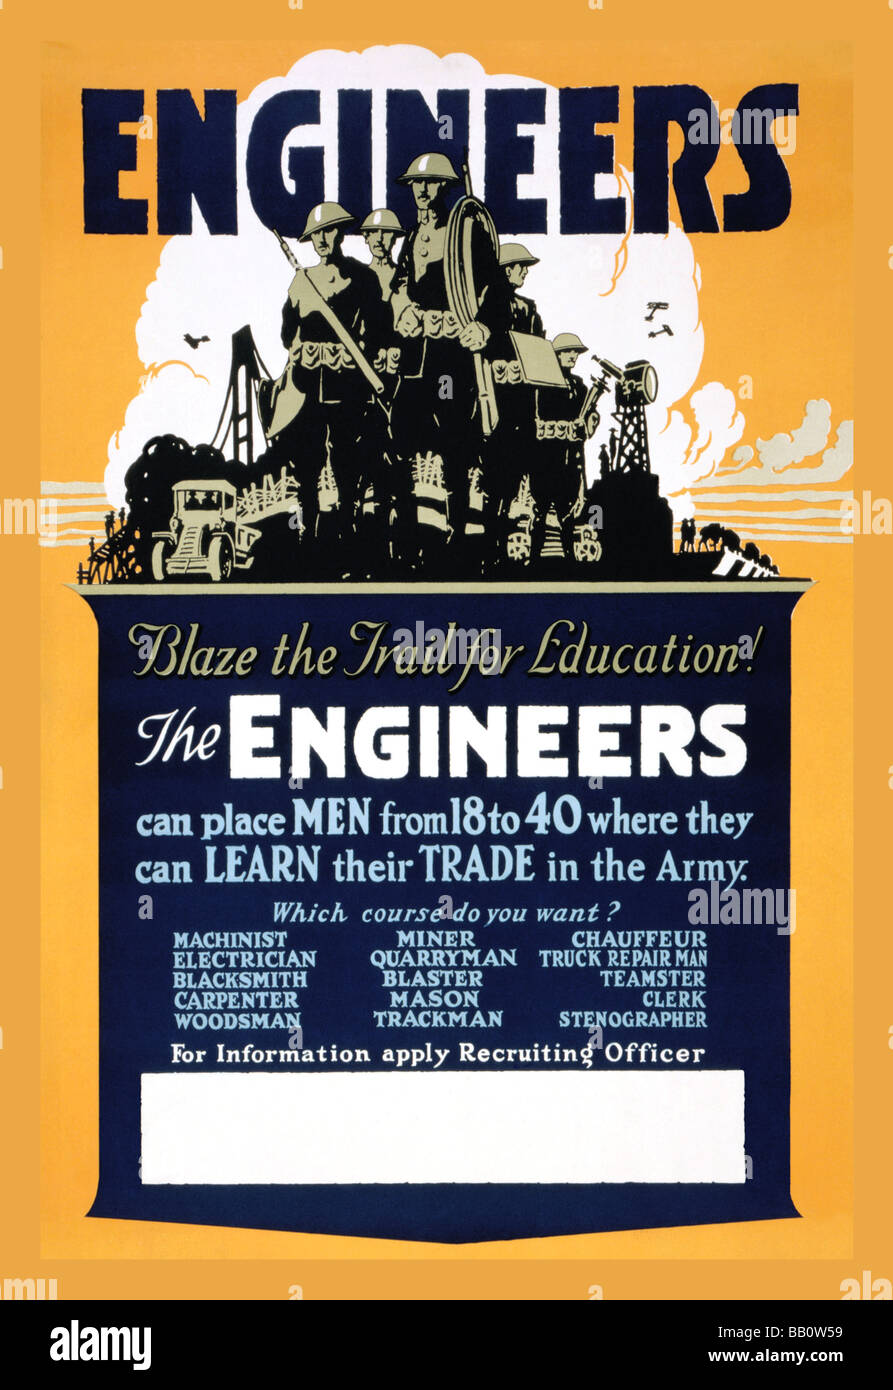 Engineers - Stock Image